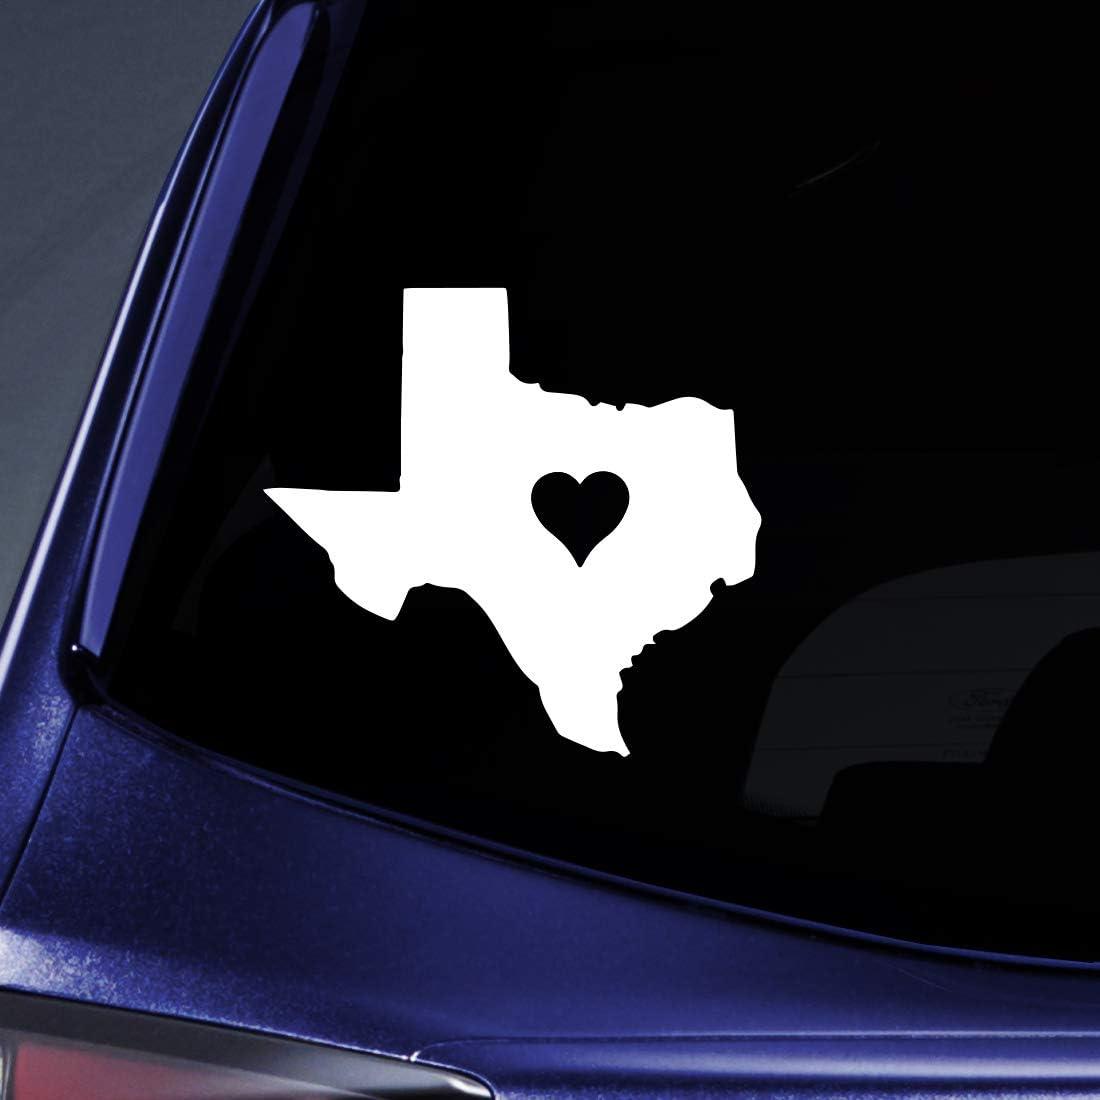 Oklahoma Home Die Cut Vinyl Decal State US Love Window Sticker Car Truck